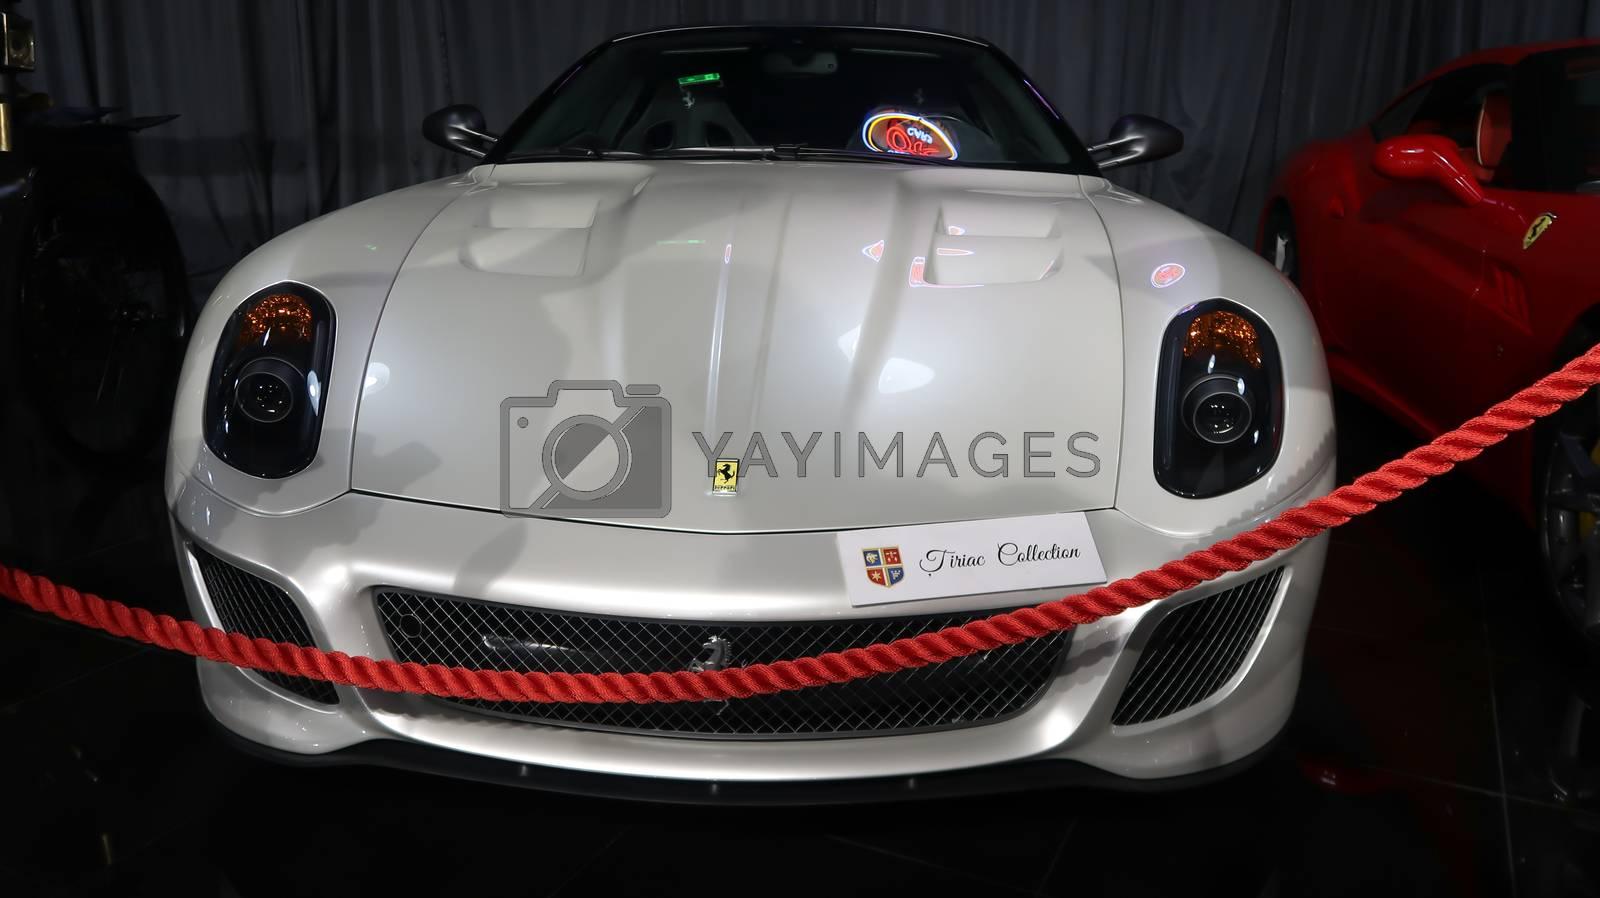 Bucharest / Romania - 07-19-2020: Tiriac Collection Showroom. Exhibition of super cars Ferrari